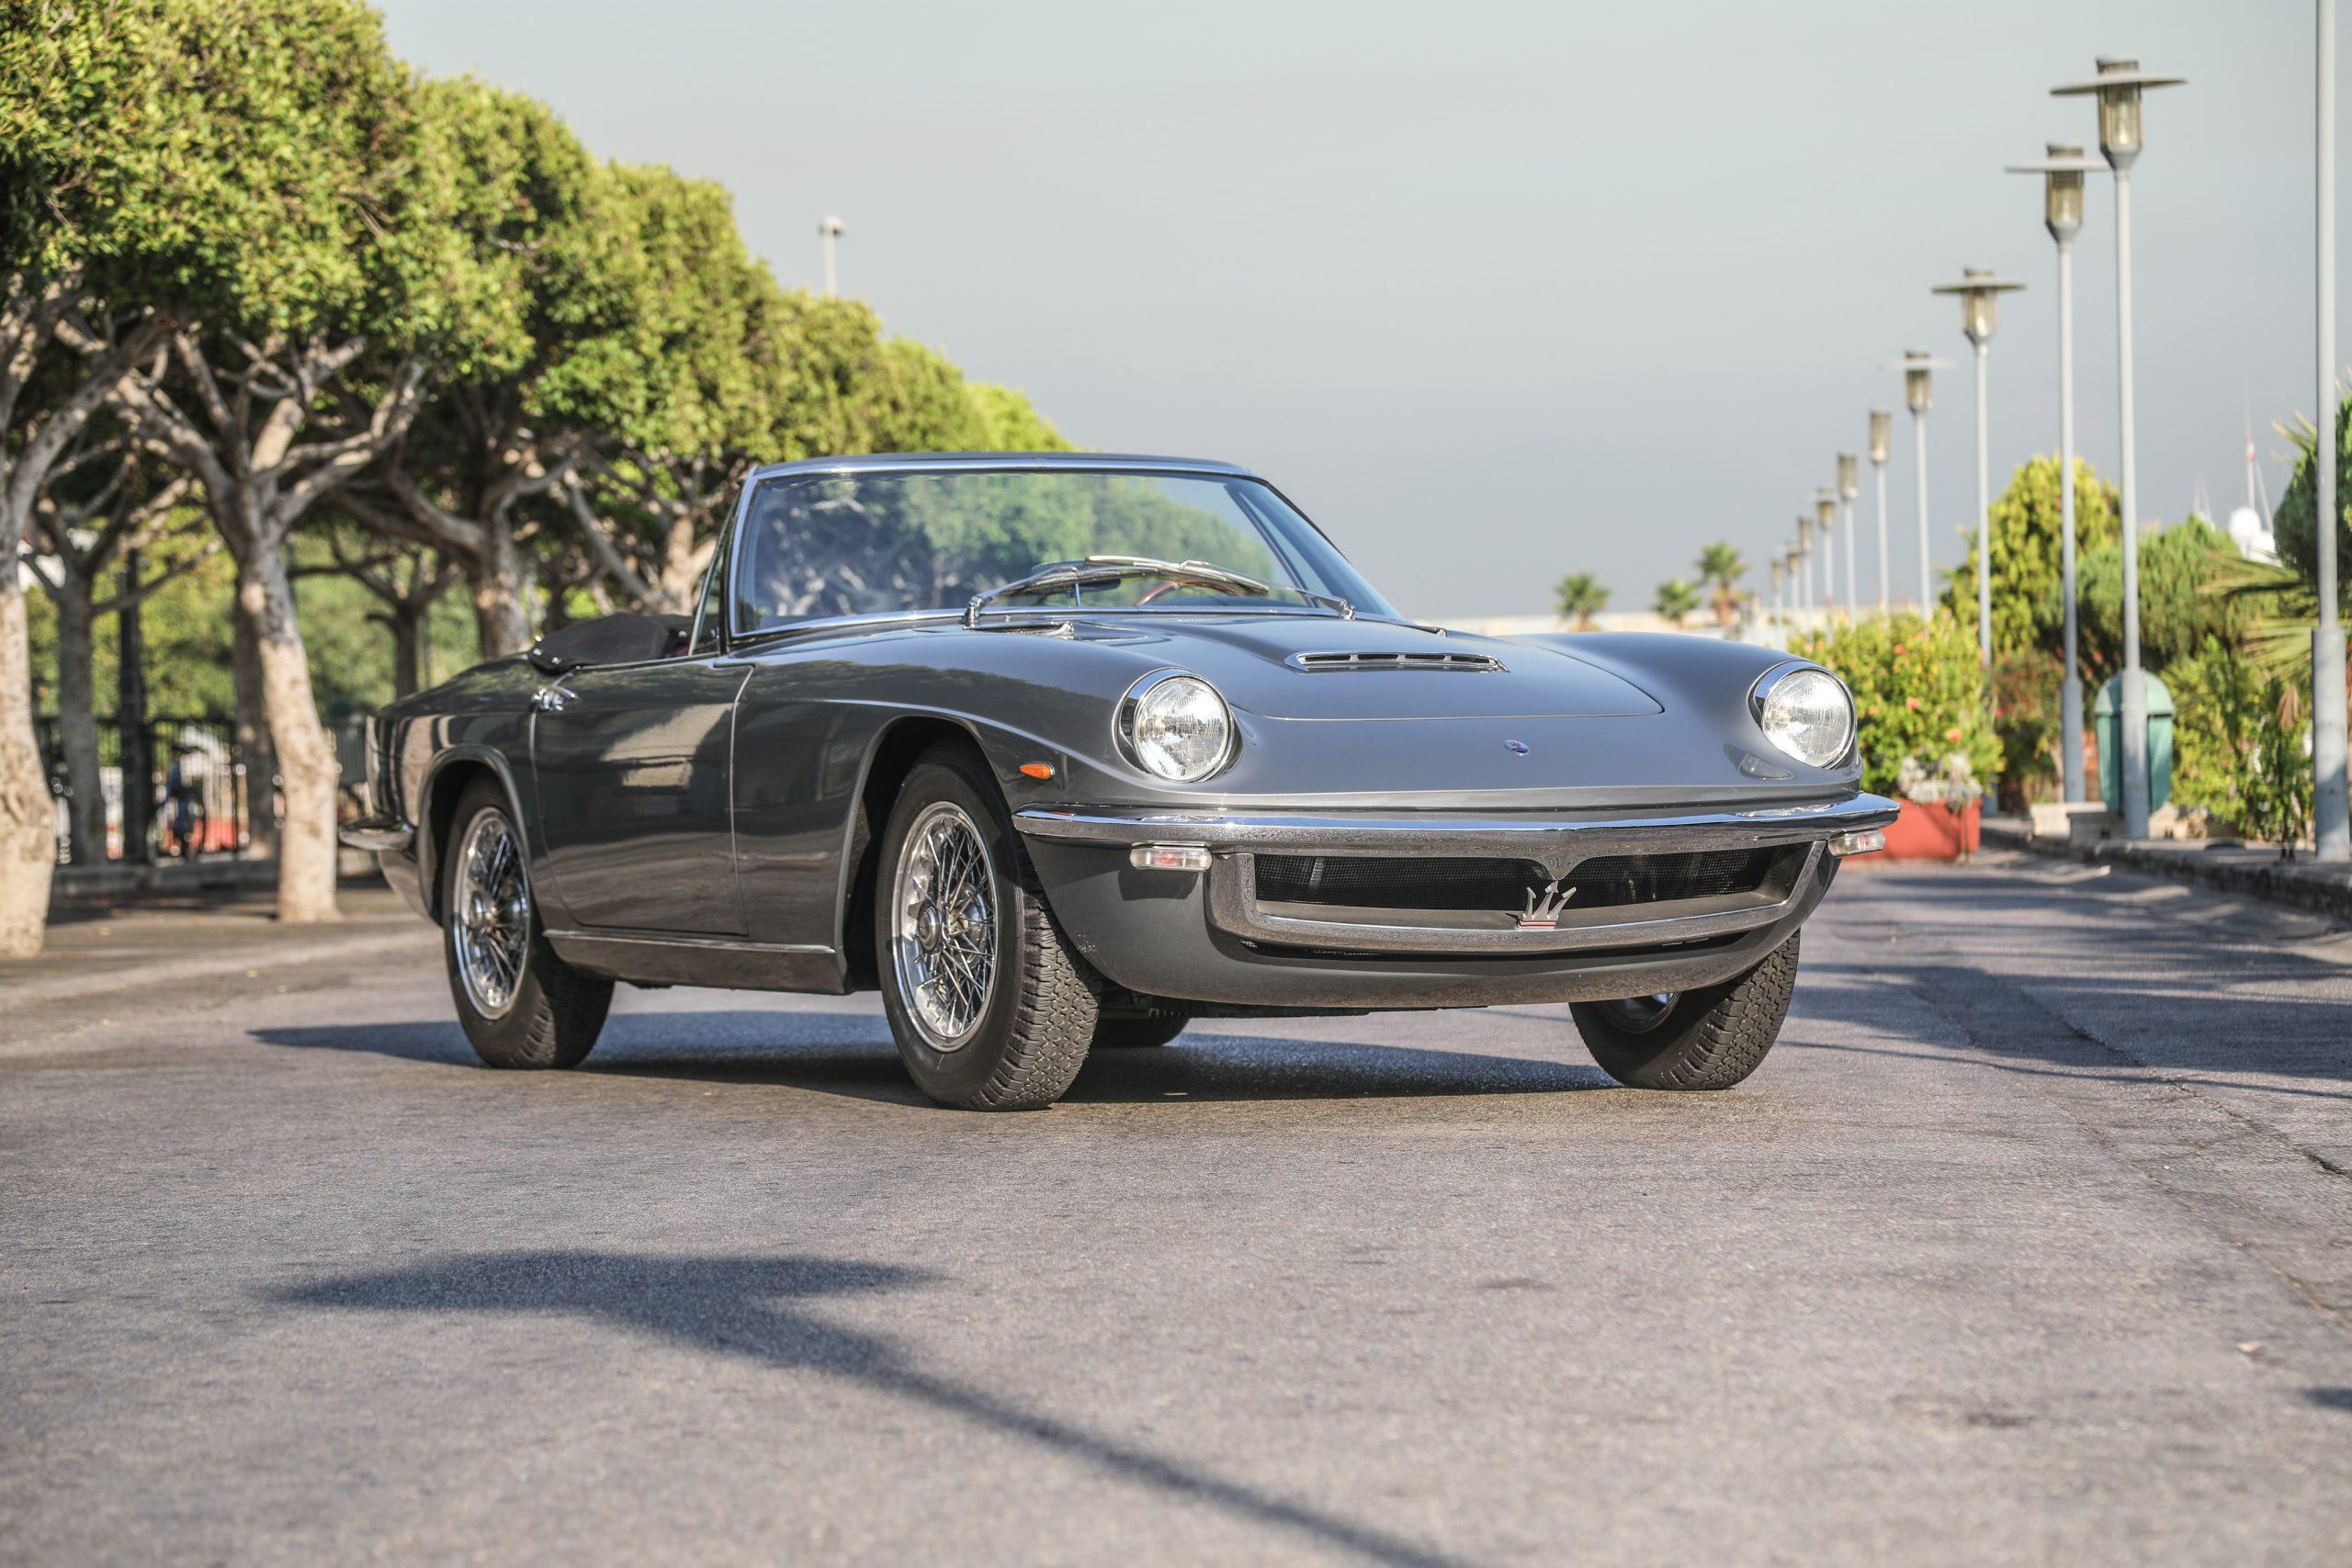 1964 Maserati 3.5-Litre Mistral Spyder